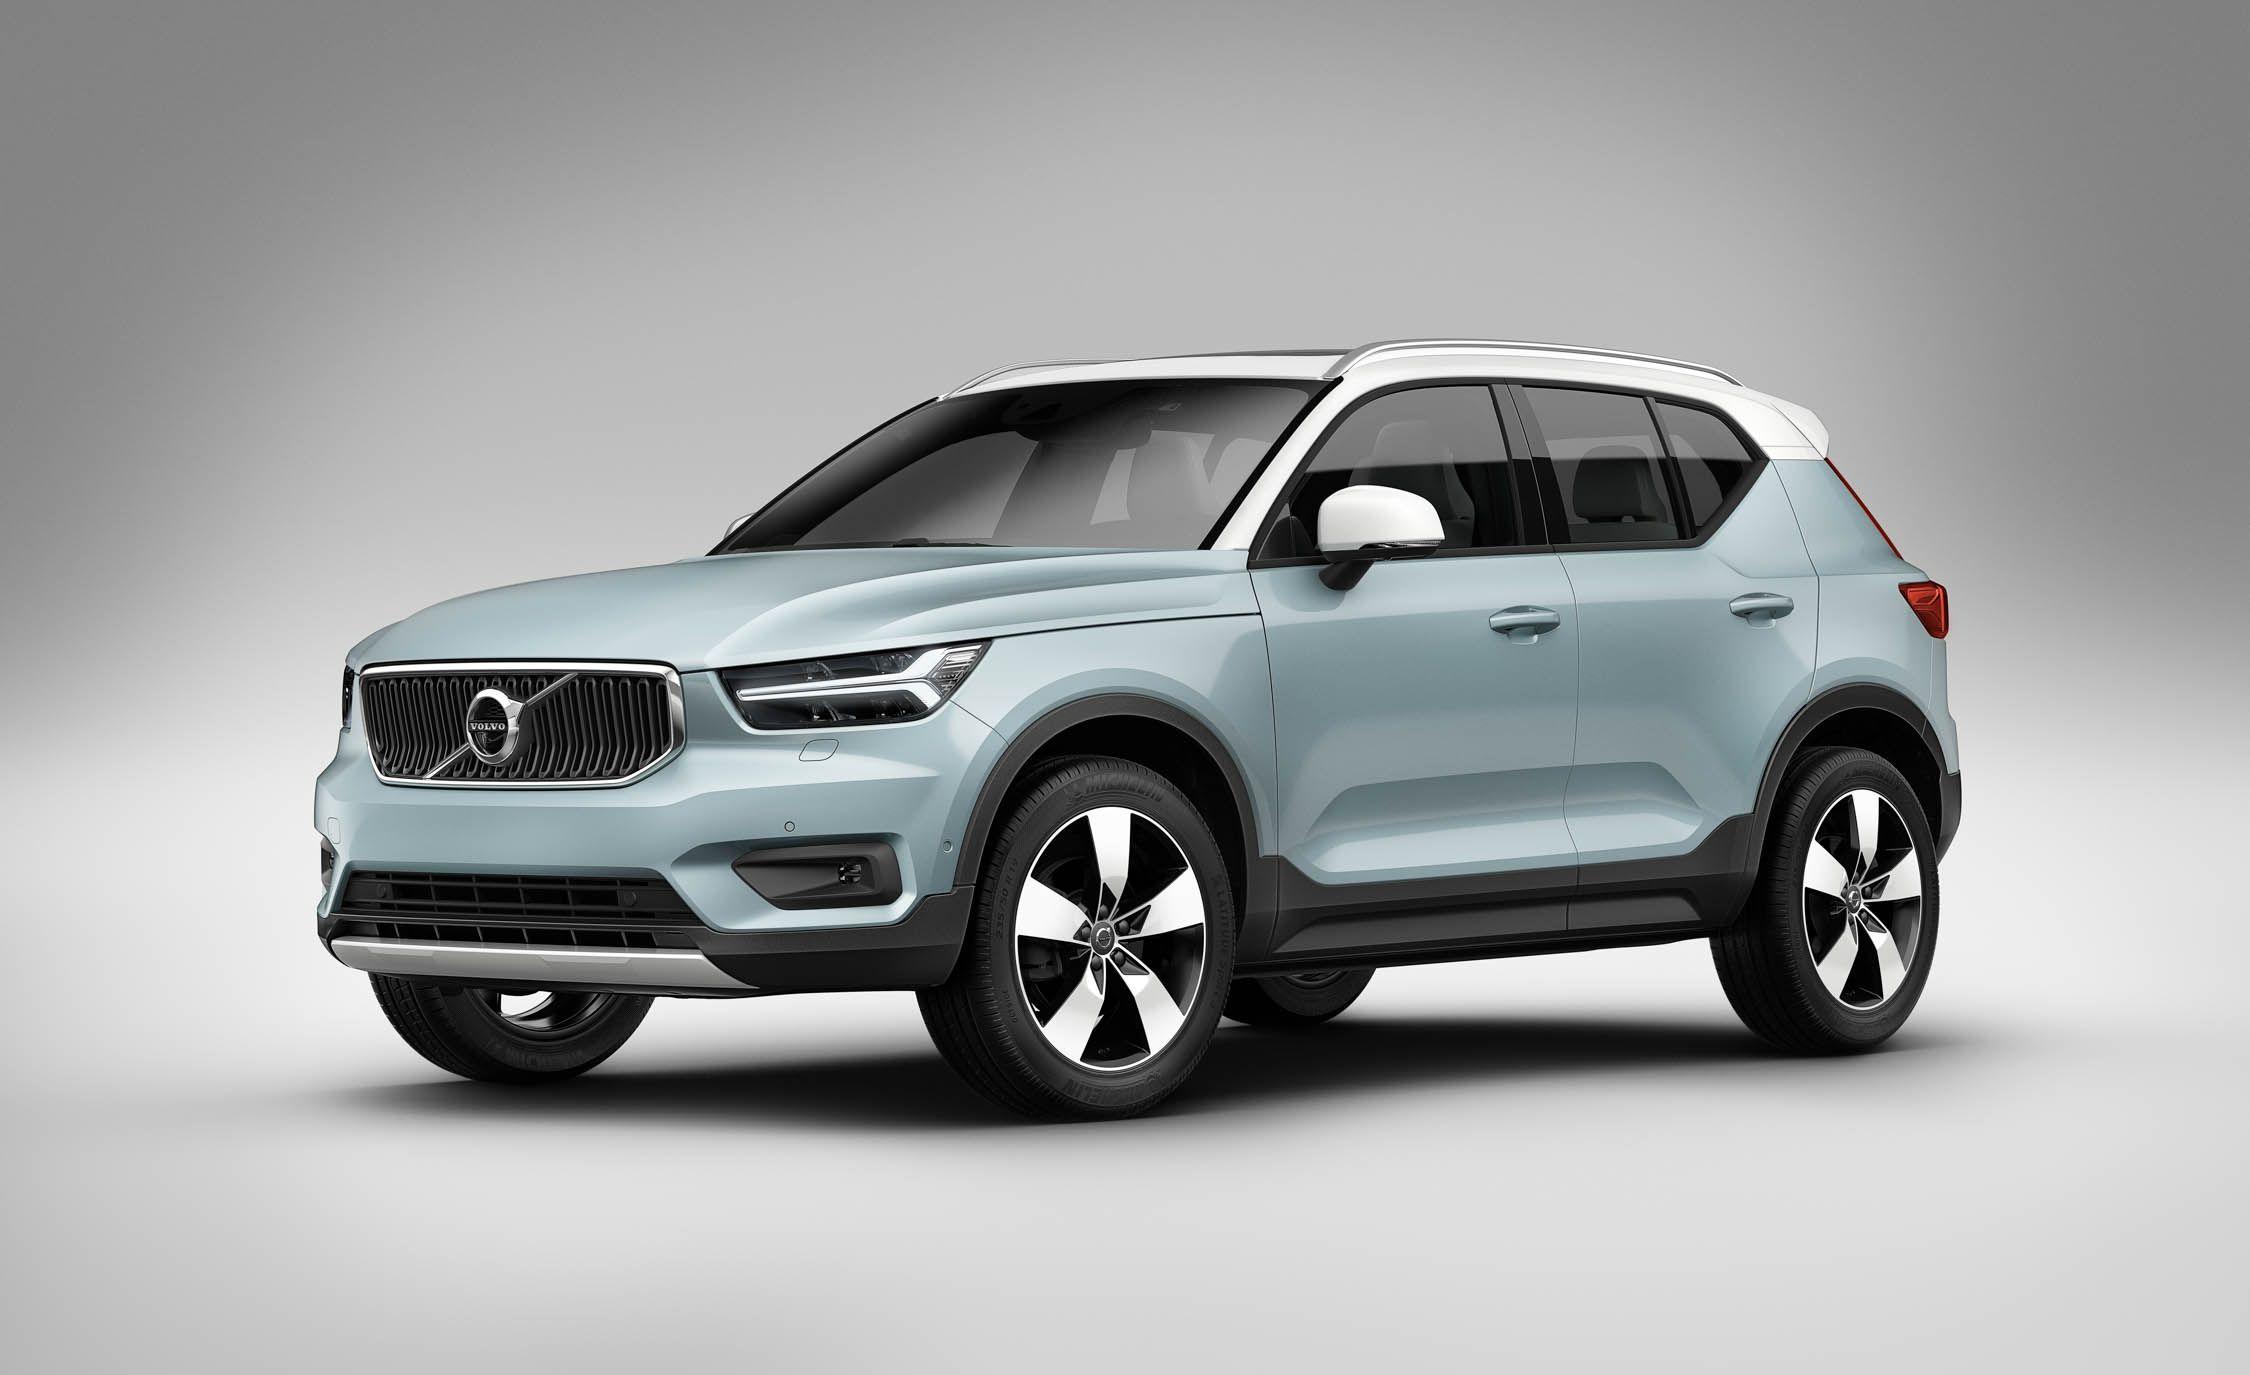 https://hips.hearstapps.com/amv-prod-cad-assets.s3.amazonaws.com/wp-content/uploads/2017/09/2018-Volvo-XC40-103.jpg